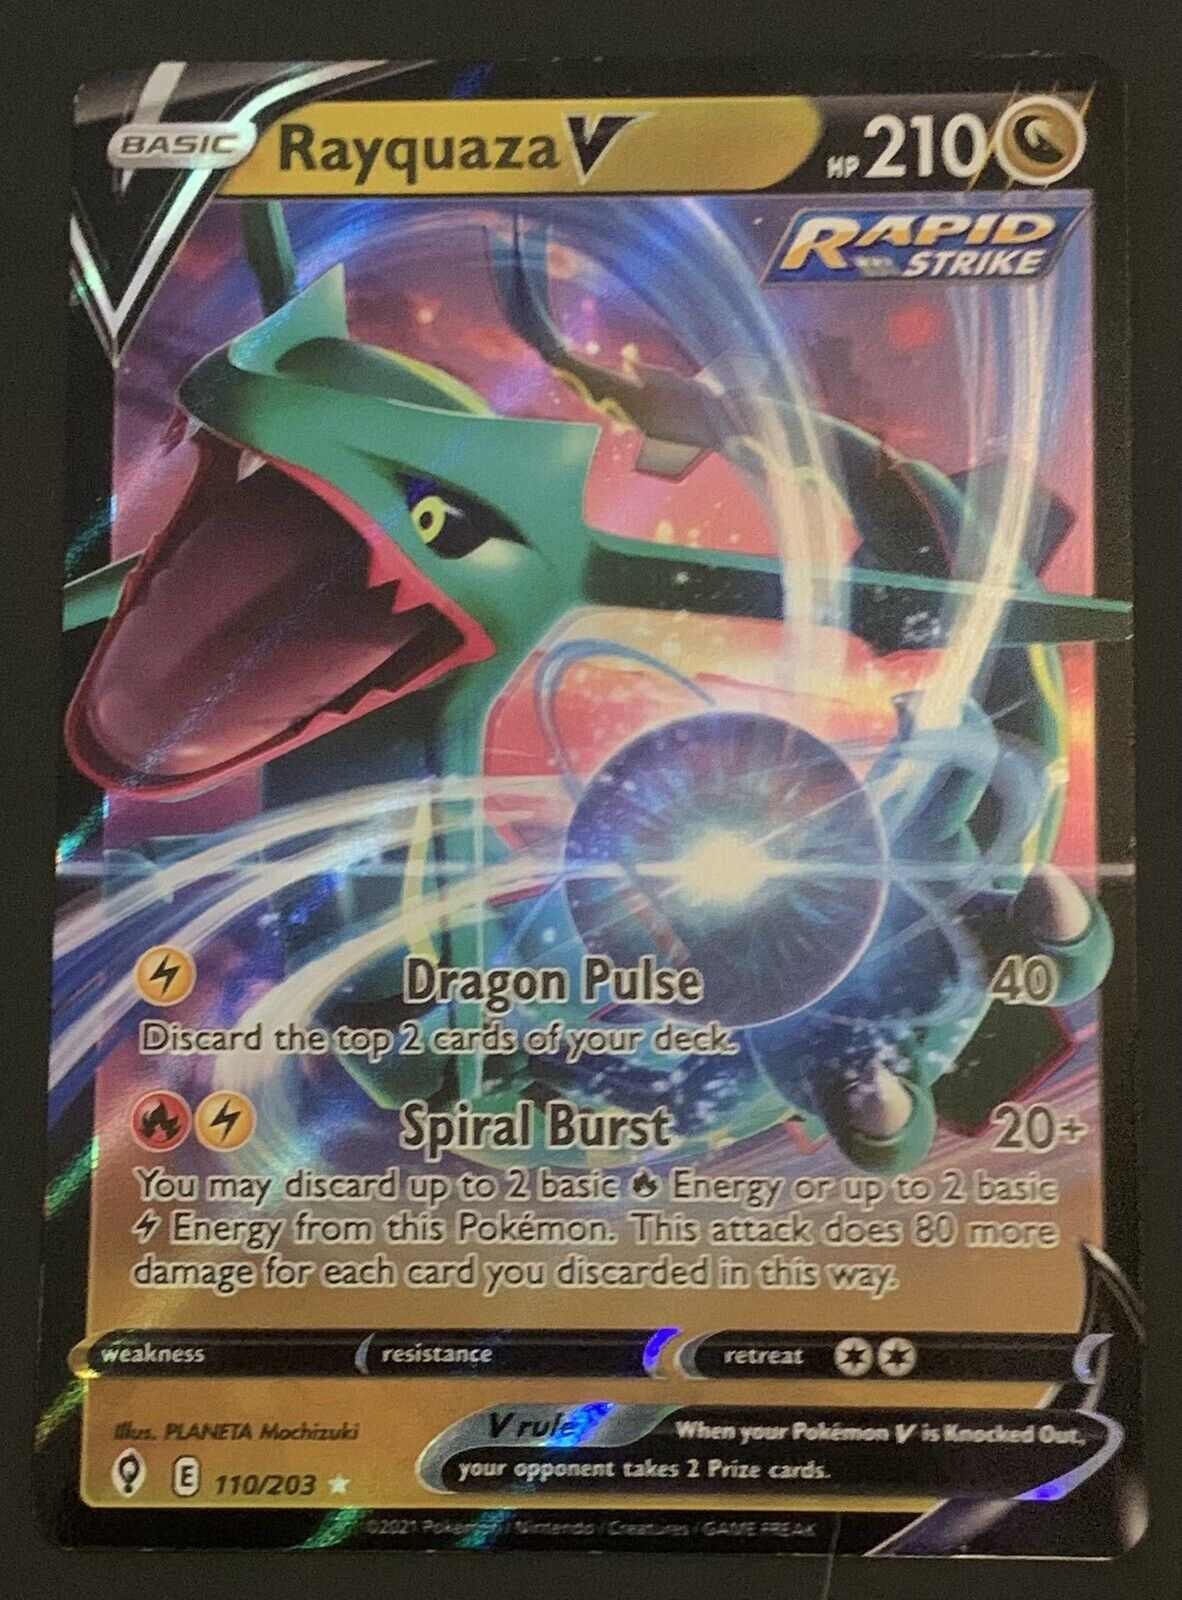 Rayquaza V Ultra Rare Pokemon Card - Evolving Skies 110/203 - MINT Condition